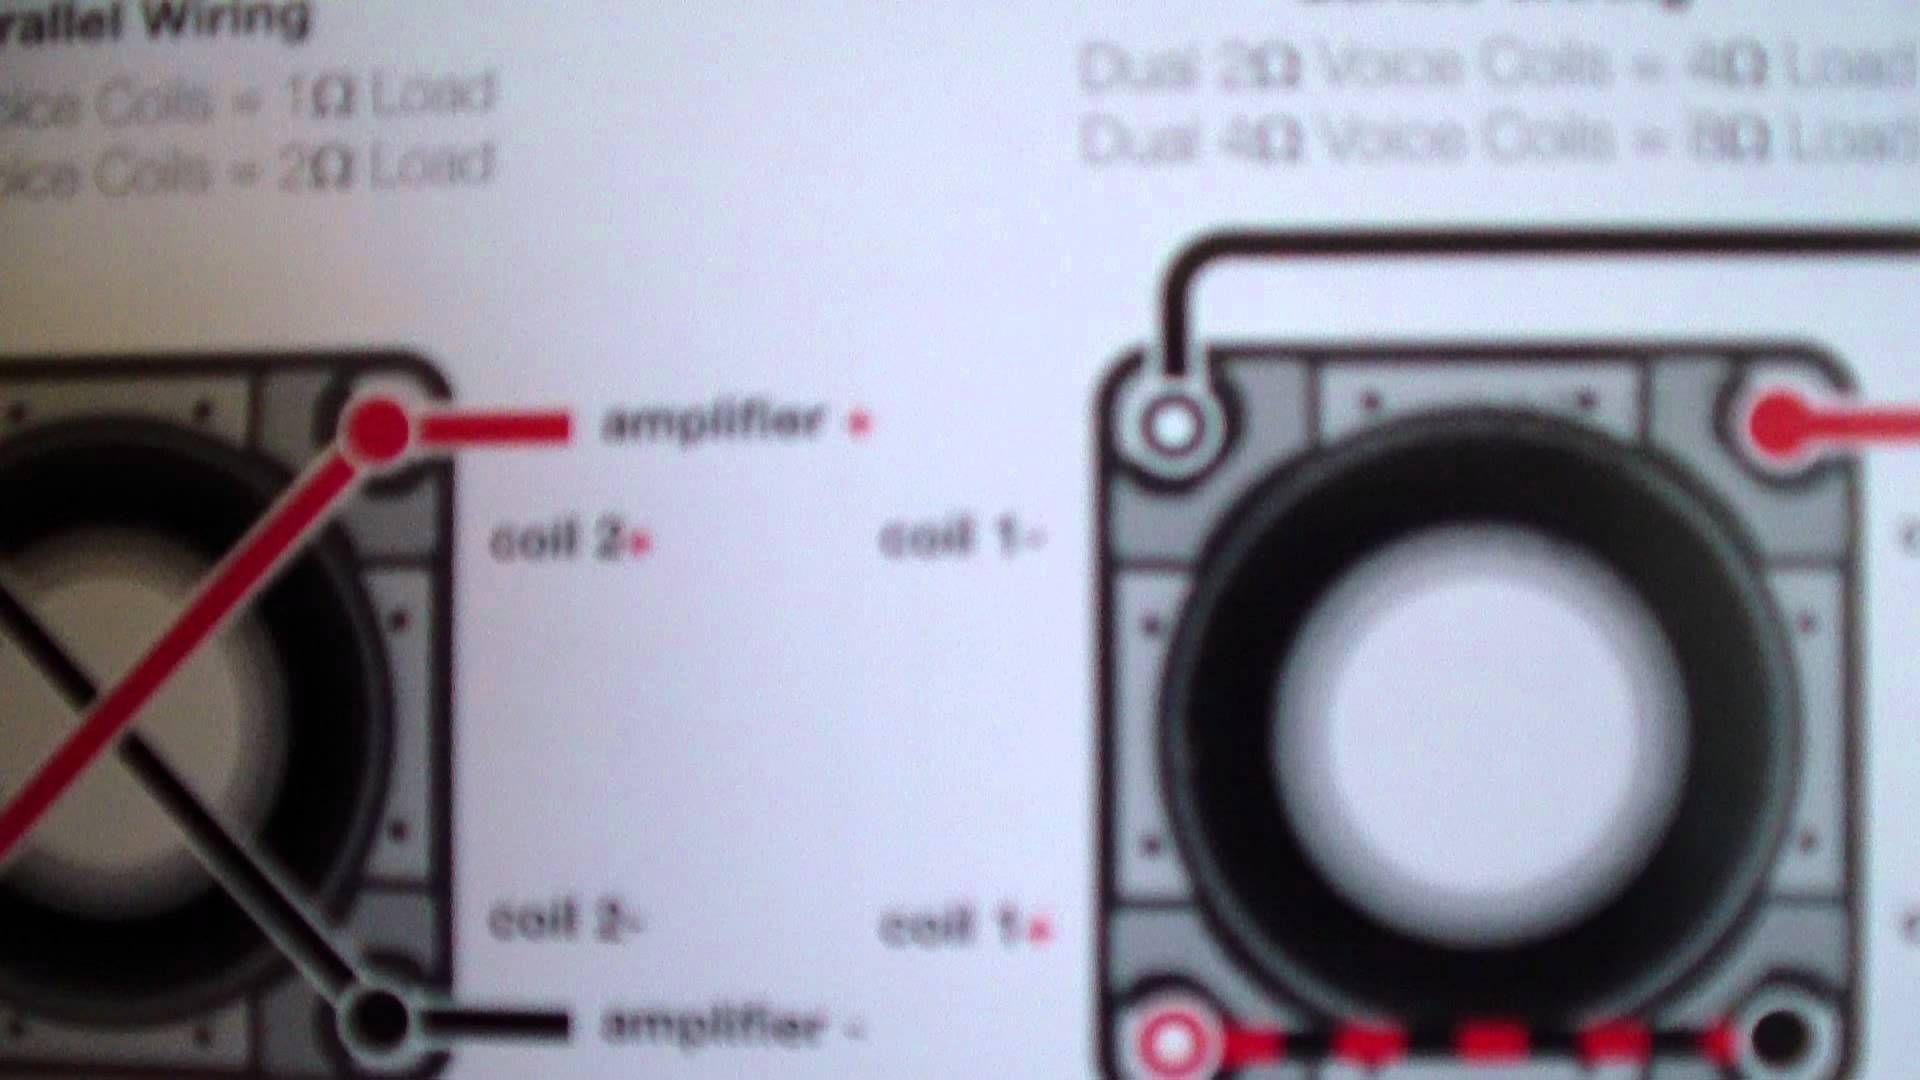 A Video On How To Wire Kicker Stuff For Joshee1347 Youtube Inside L7 Wiring Diagram 1 Ohm Kicker Subwoofer Kicker Amps Ohms